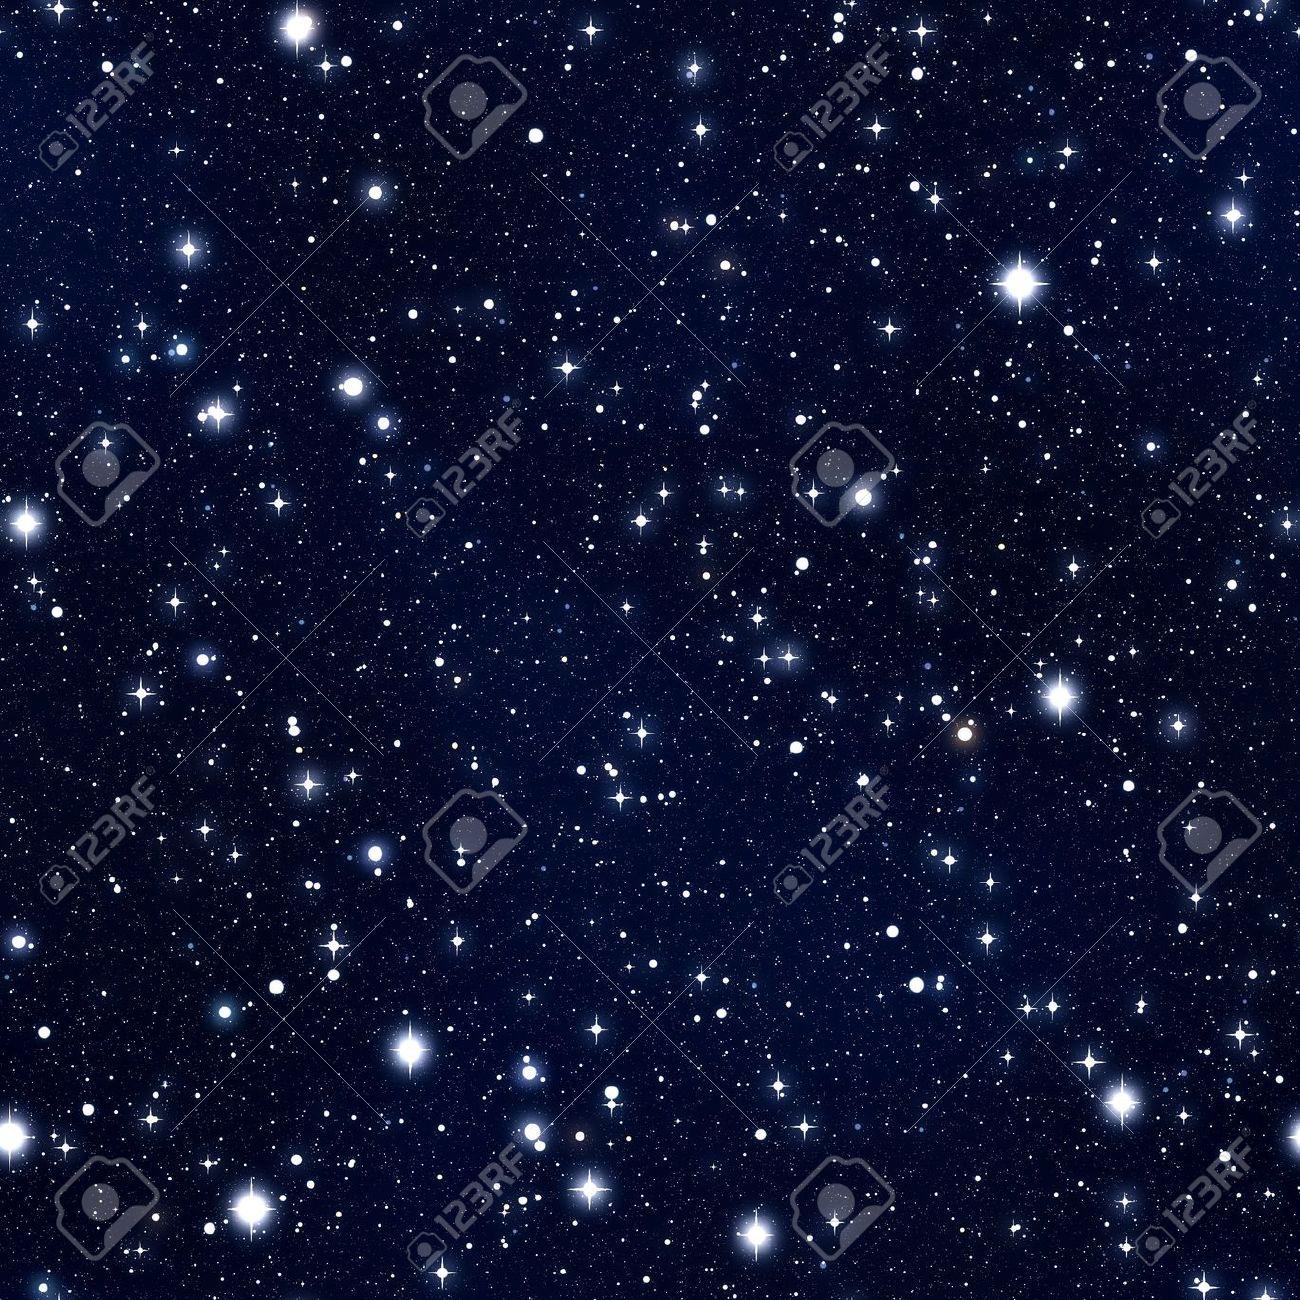 Seamless texture simulating the night sky with stars Stock Photo - 10437407